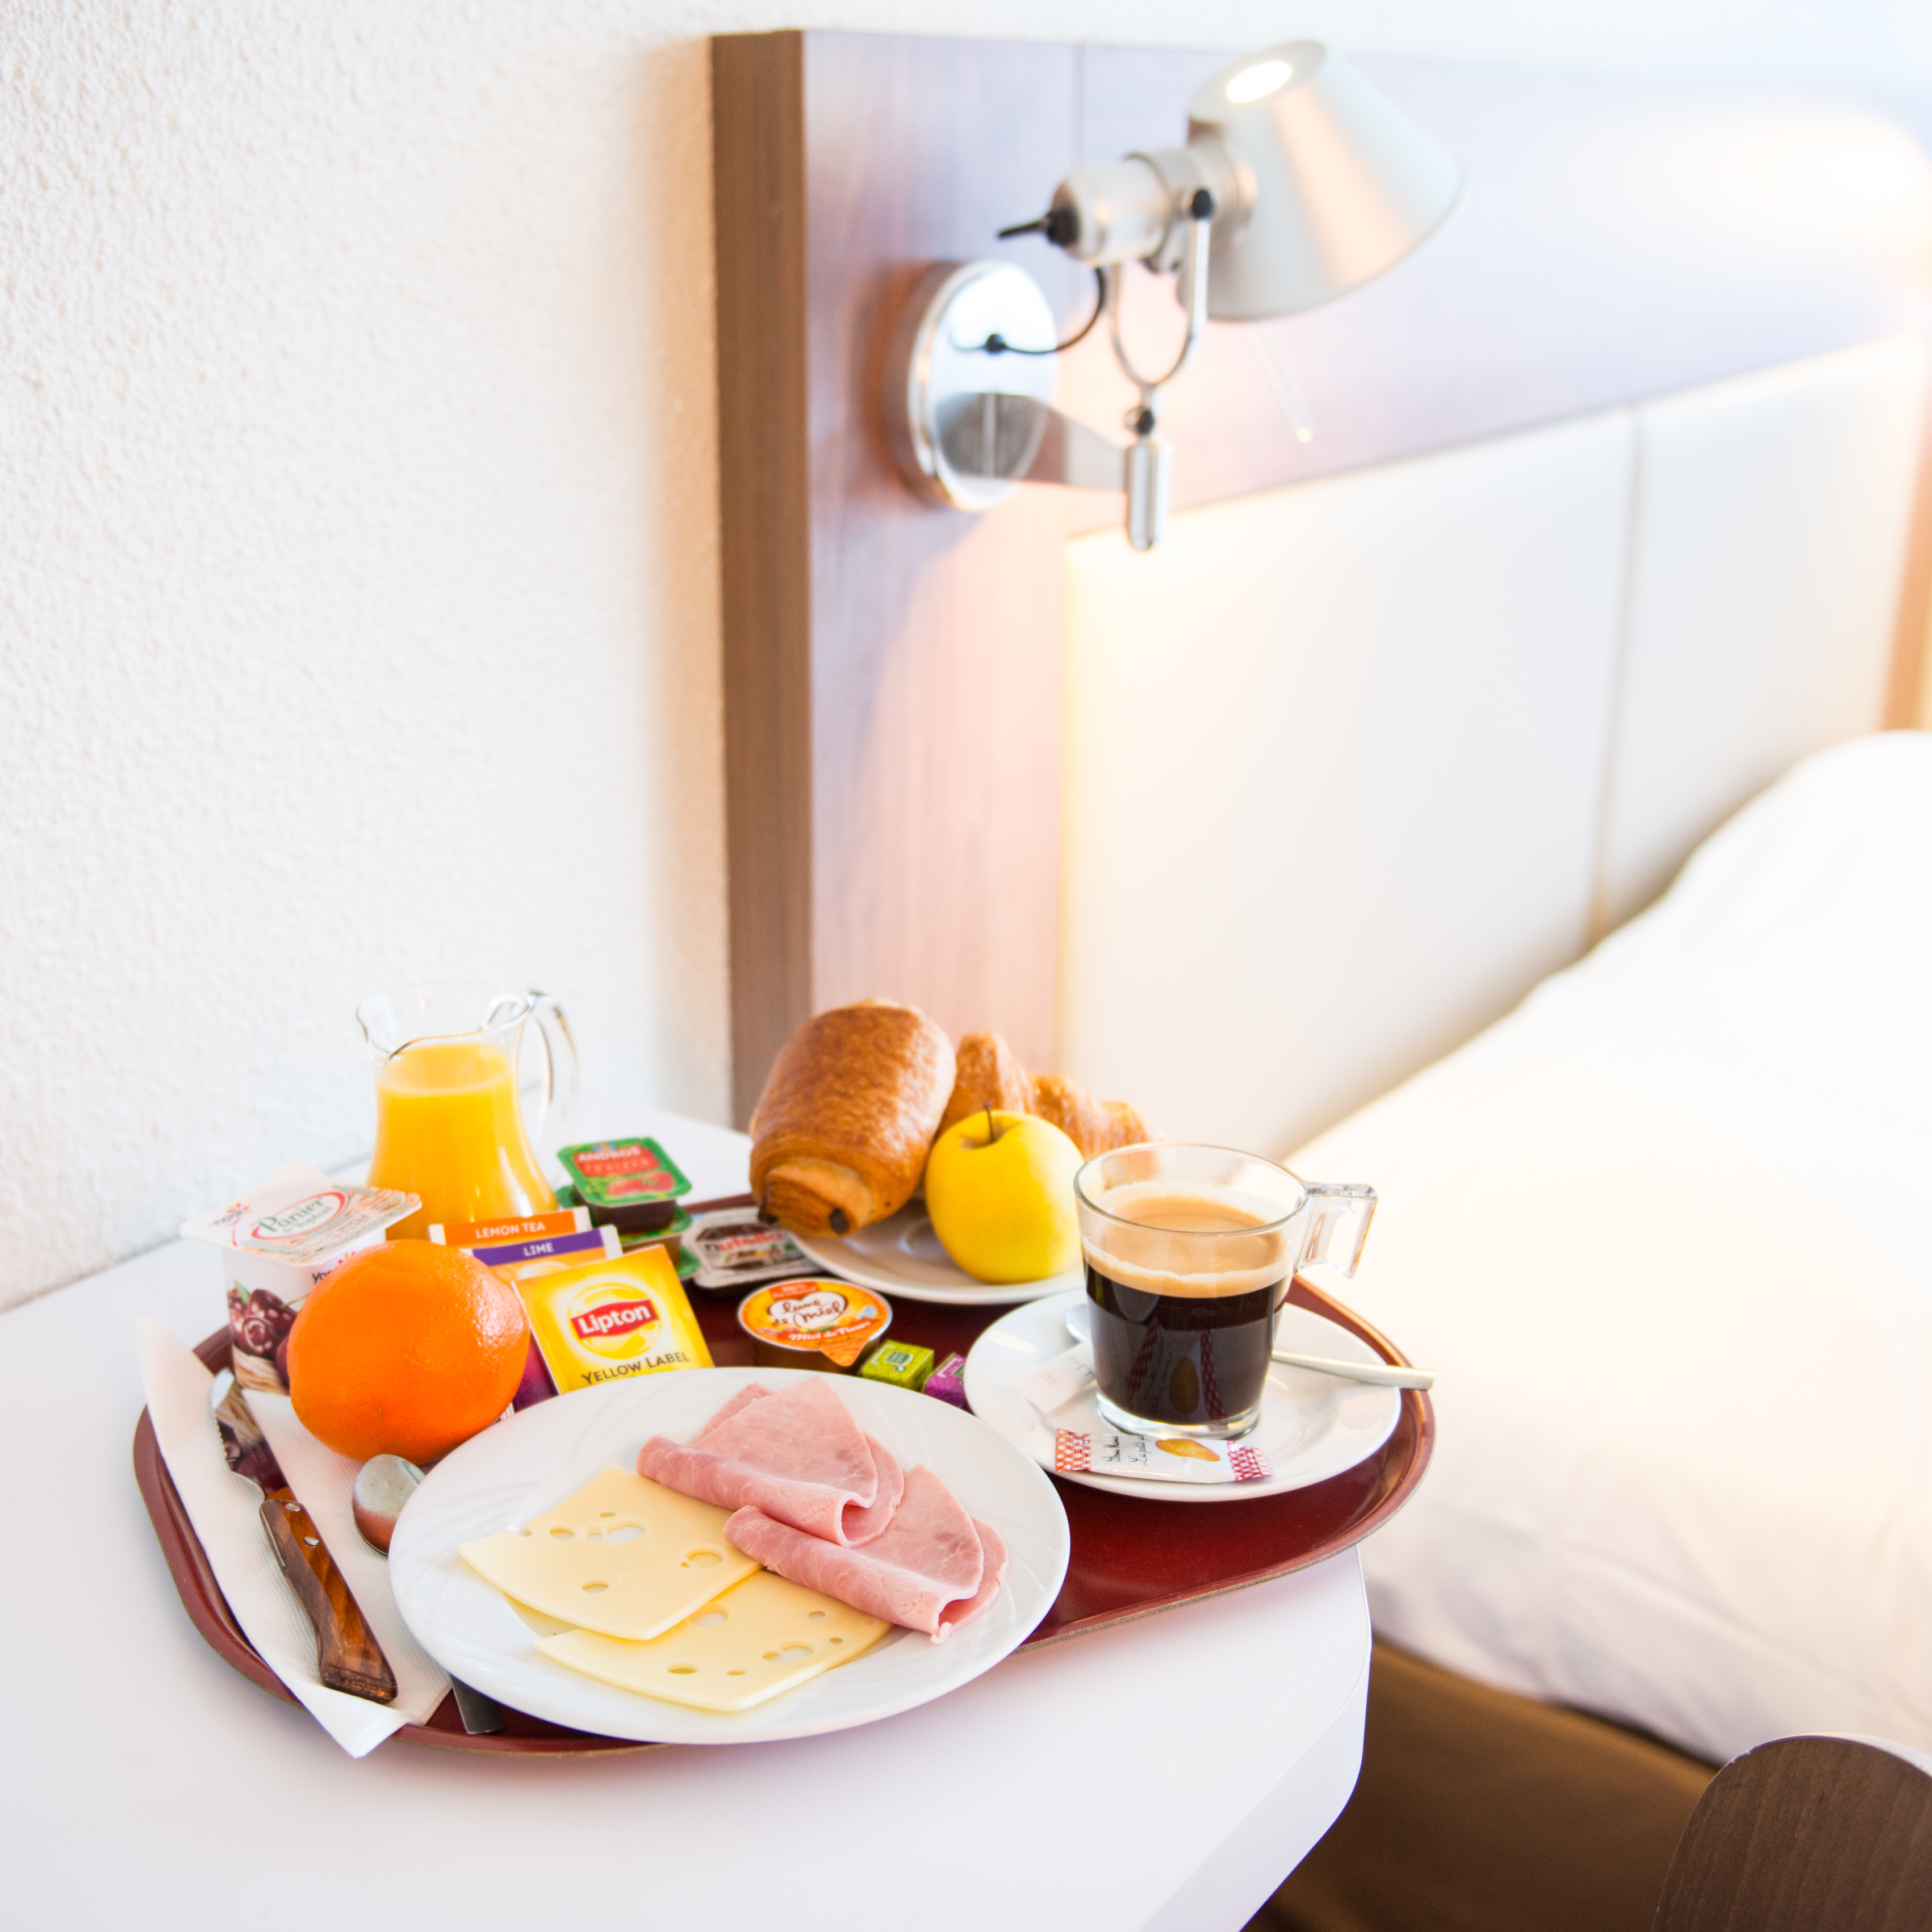 hotel petit dejeuner photgraphe